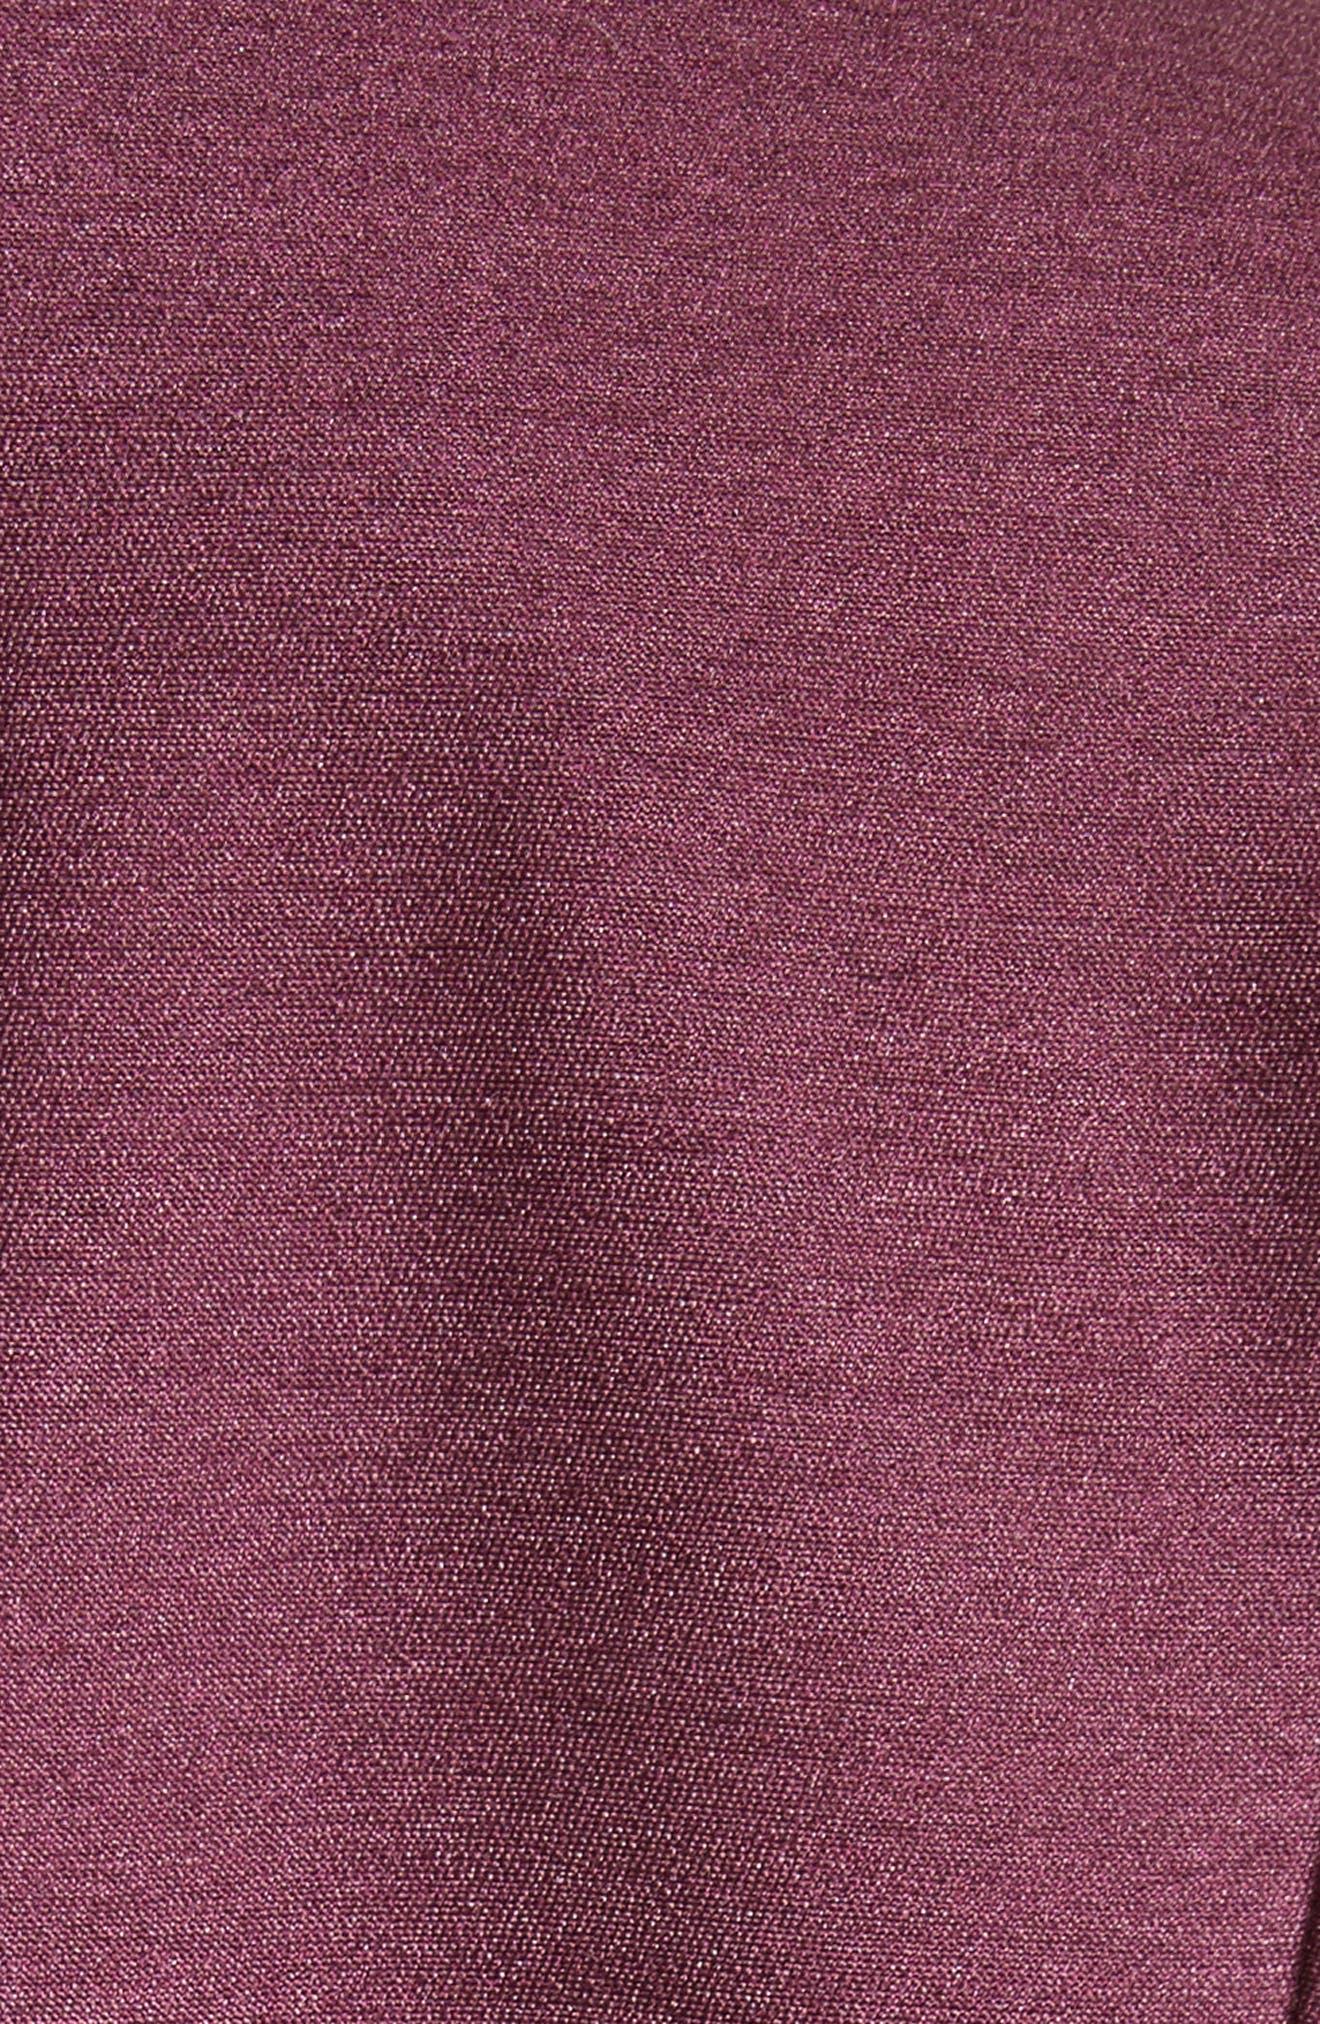 Narika Wool & Silk Jacket,                             Alternate thumbnail 6, color,                             500